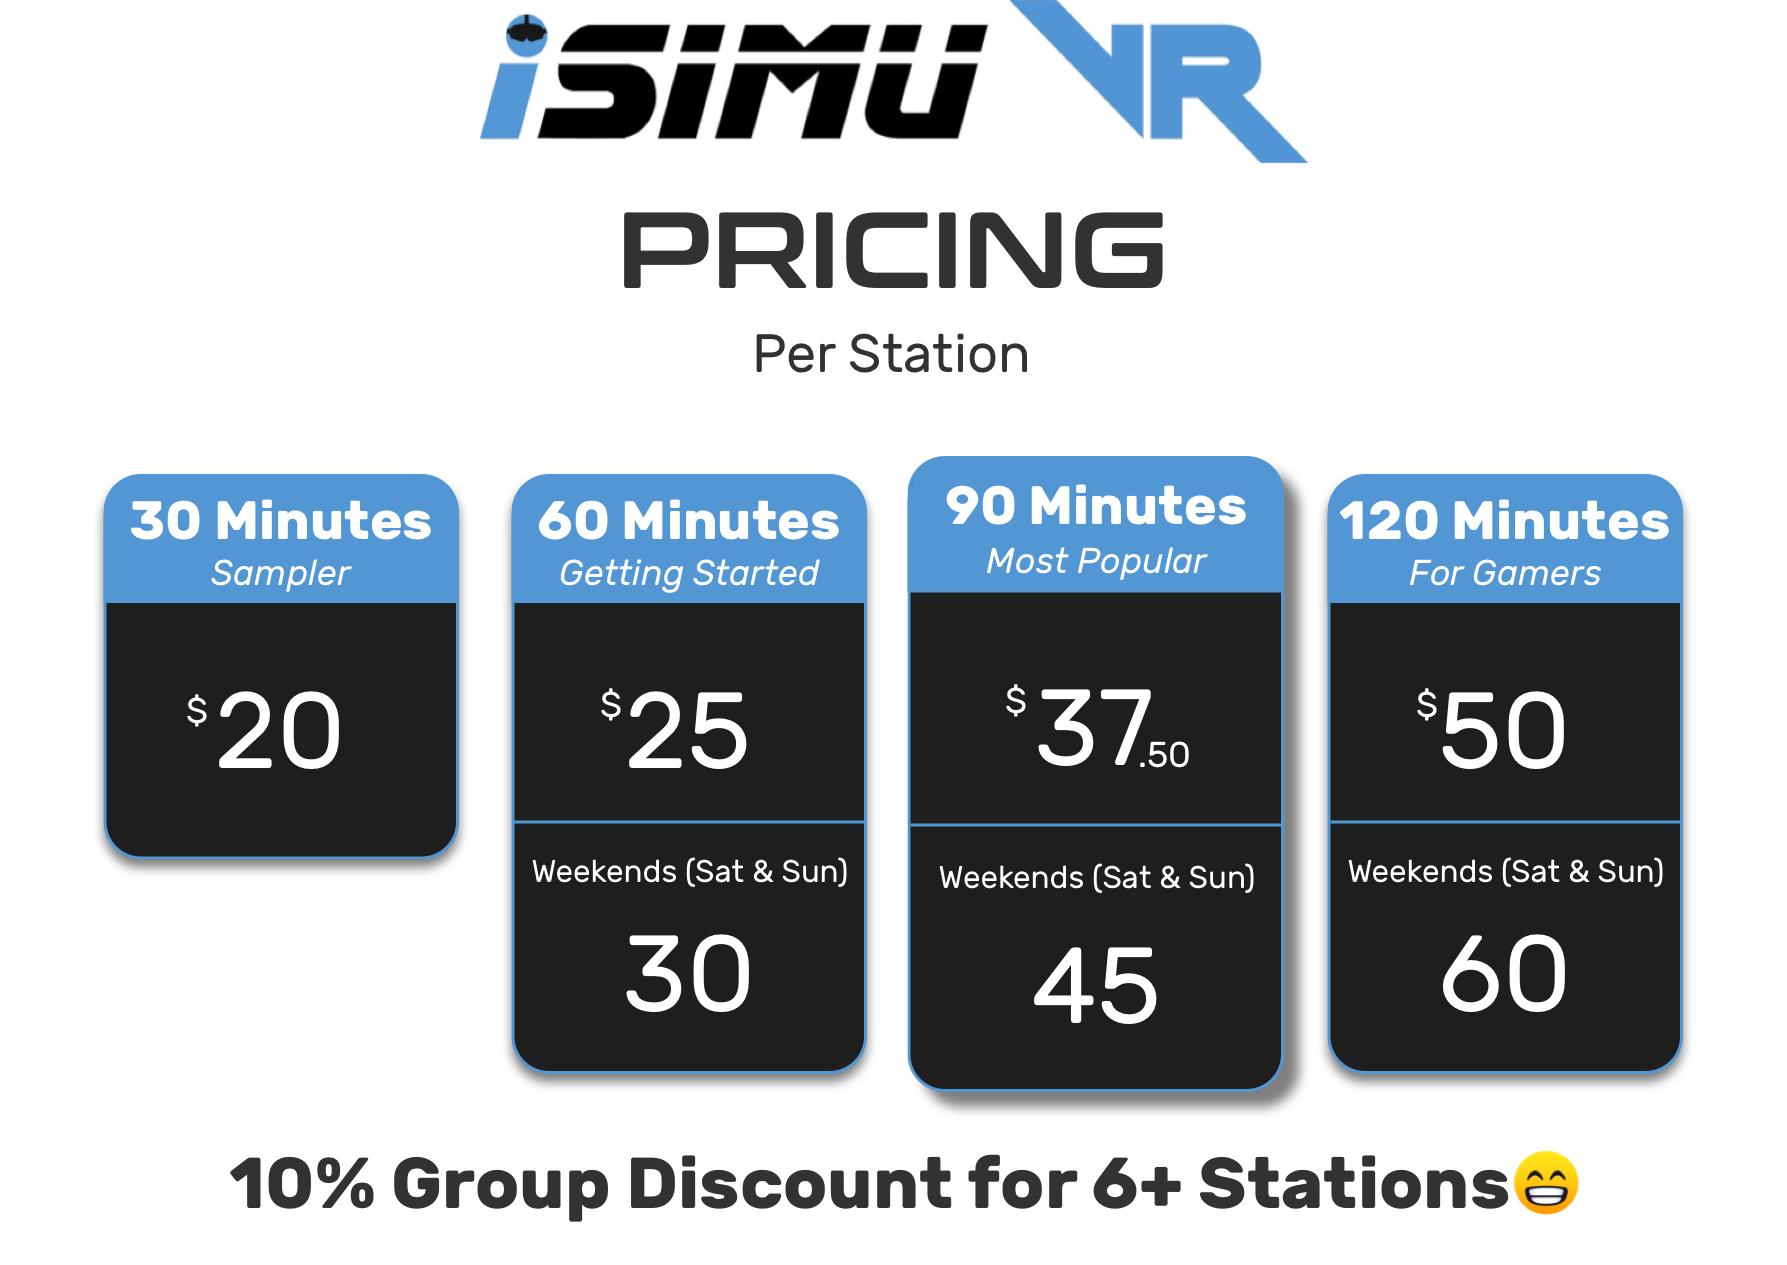 New iSimu VR Pricing